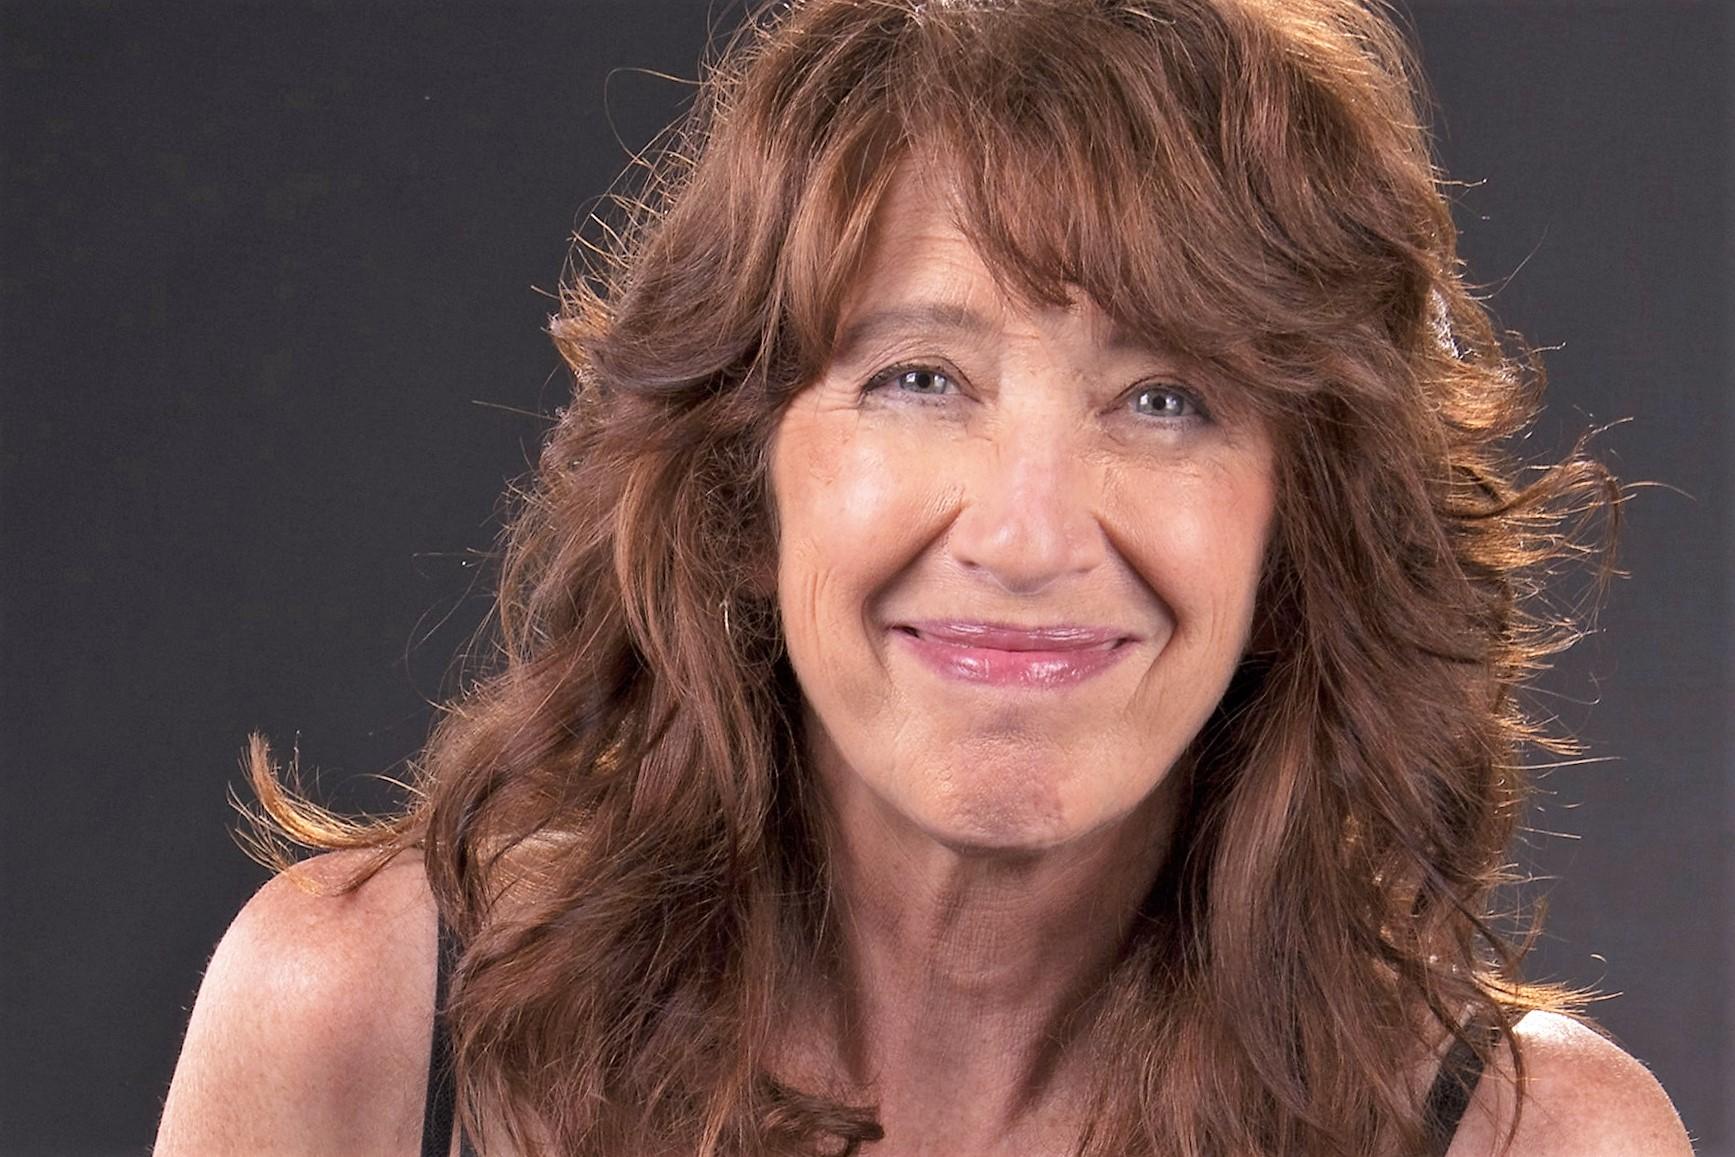 Vicki Ray (photo: Lefterisphoto.com)